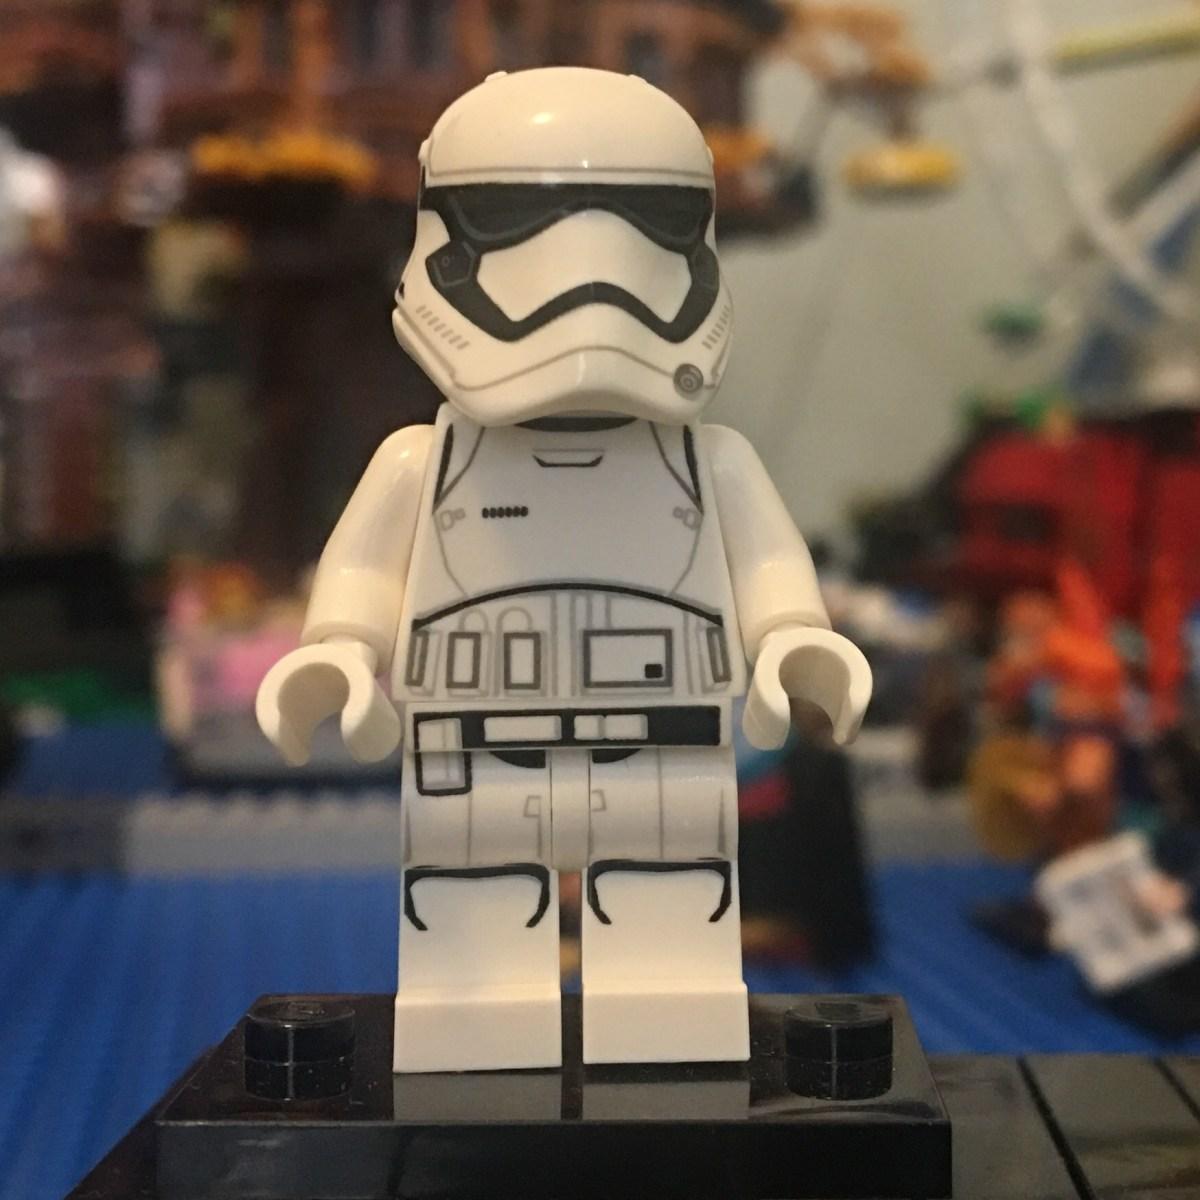 lego star wars first order stormtrooper minifigure  brick